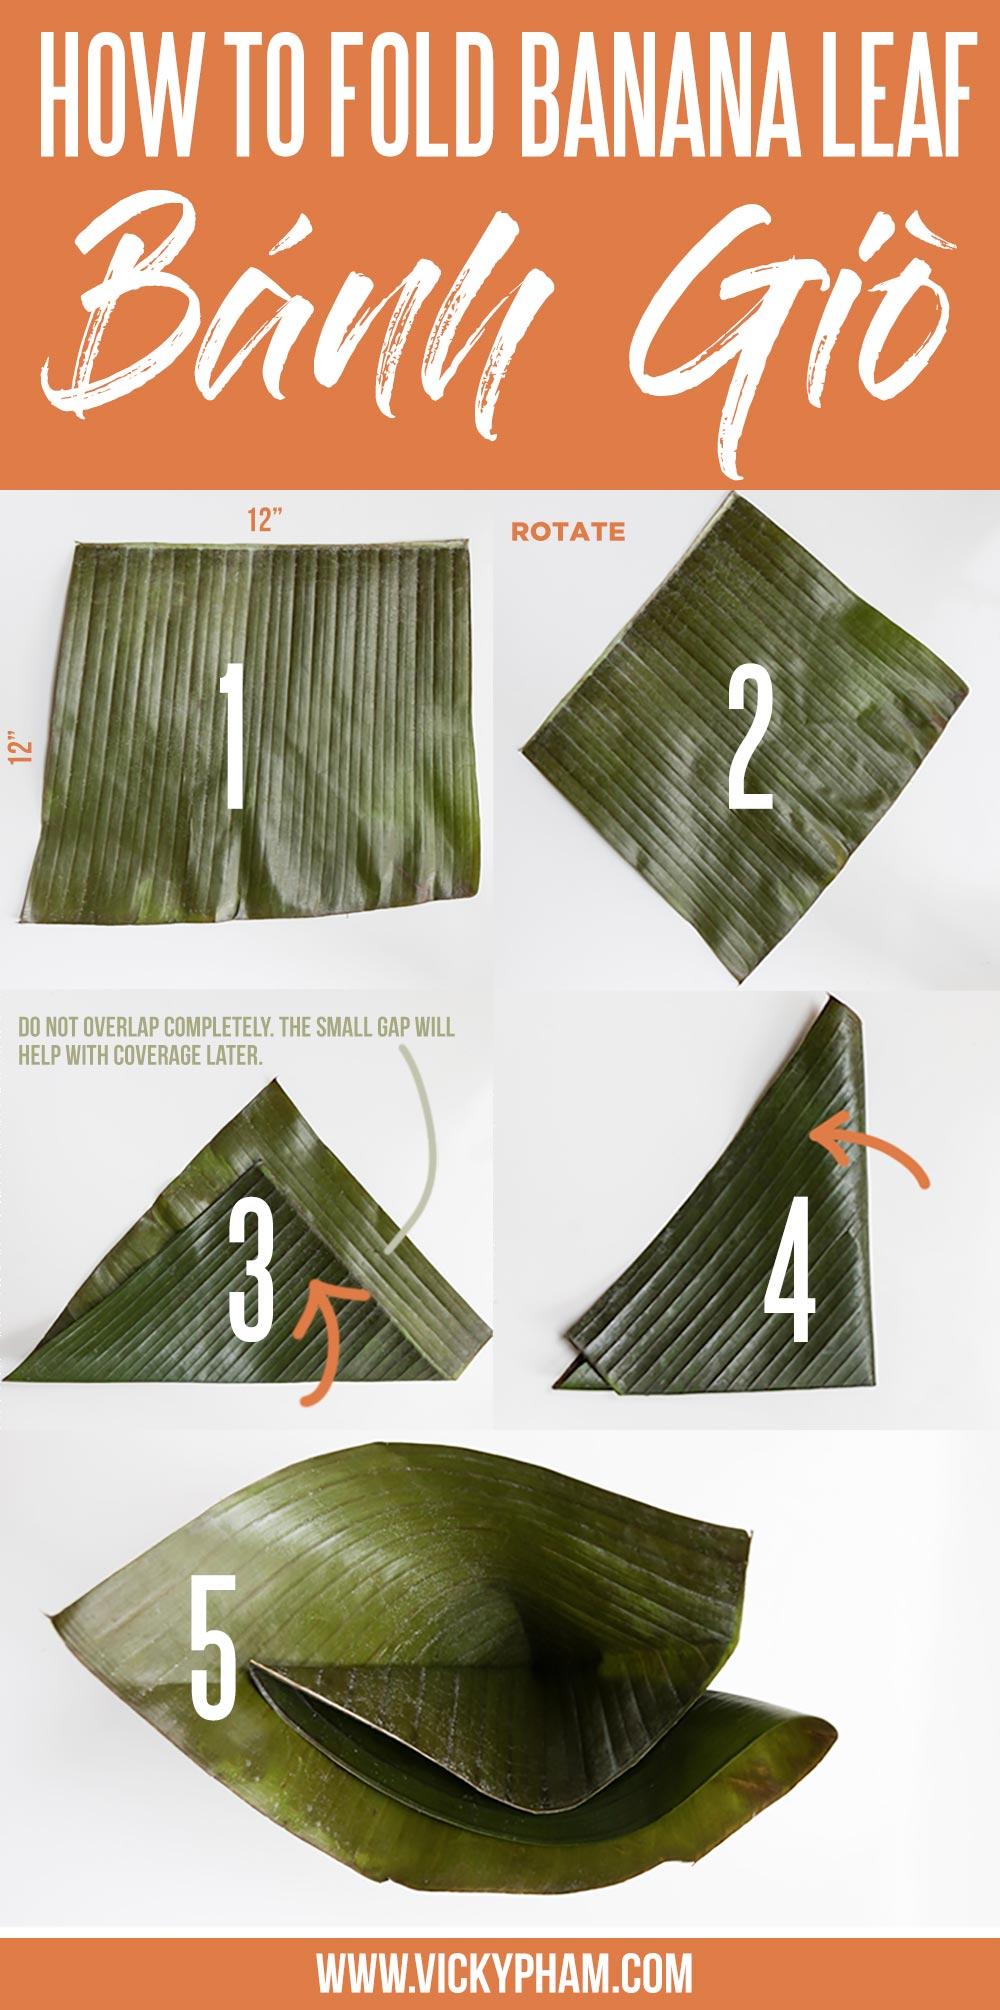 banh-gio-how-to-fold.jpg